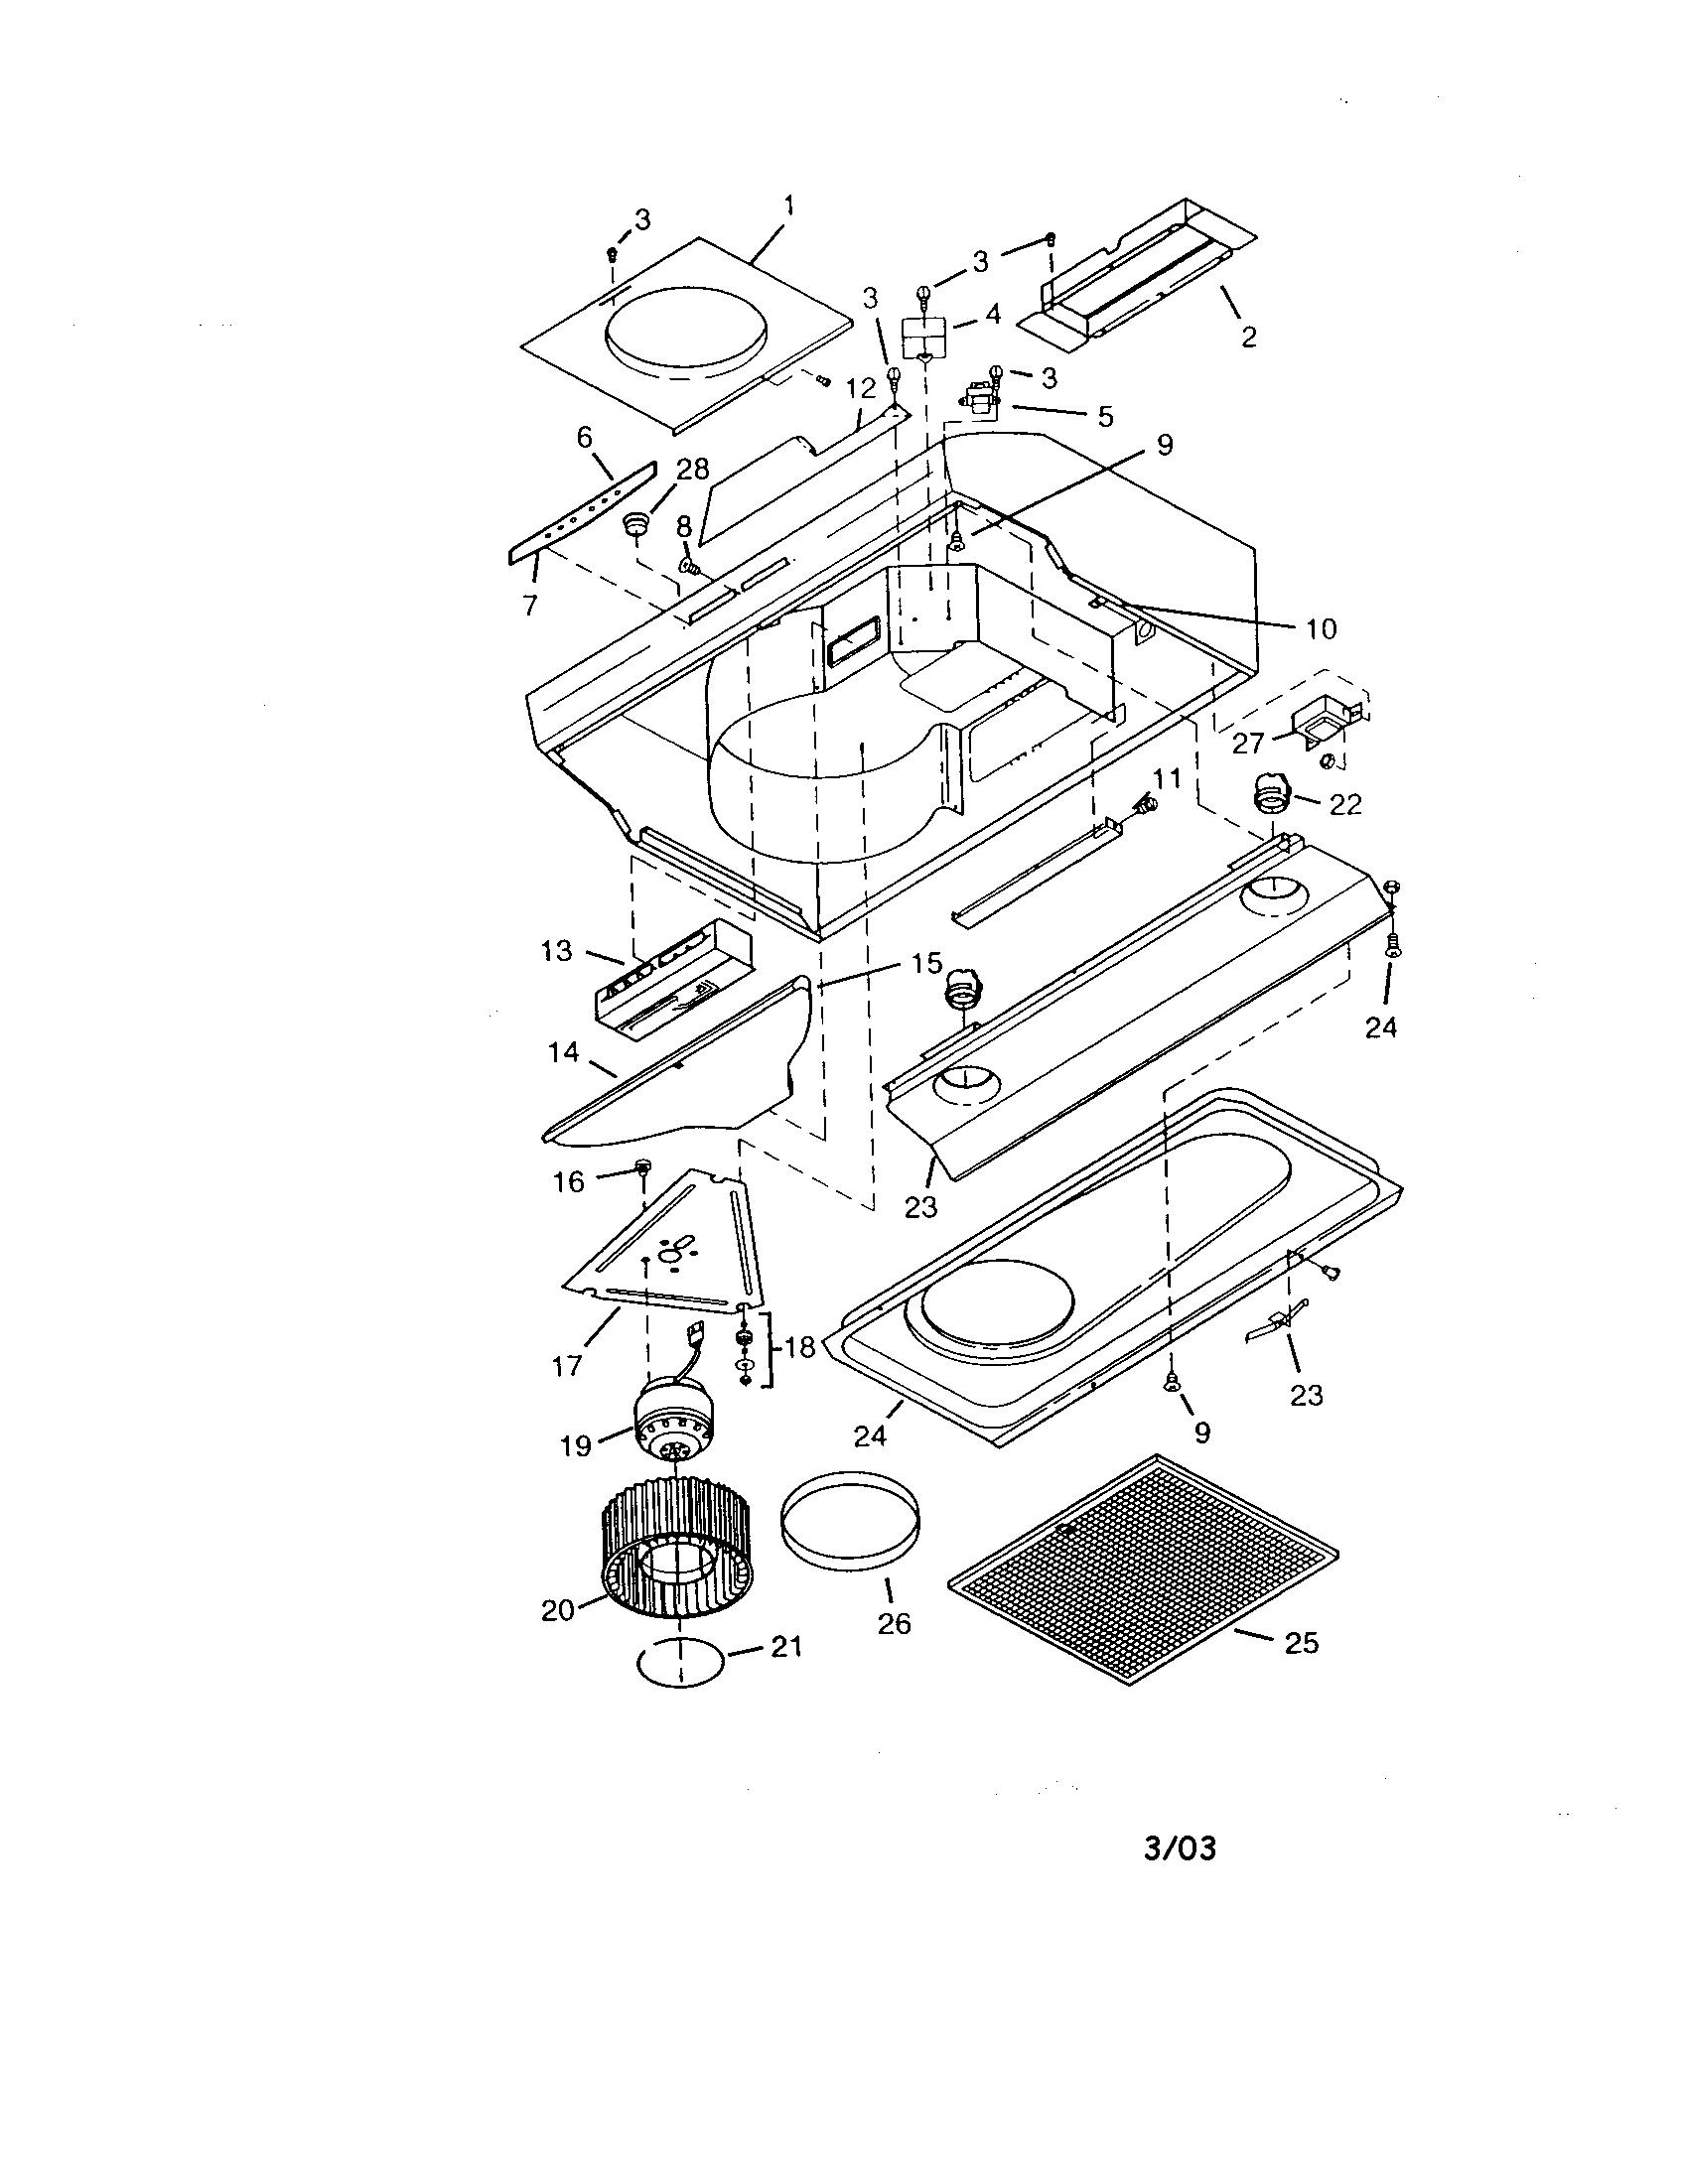 Range Hood Diagram  U0026 Parts List For Model 23355012000